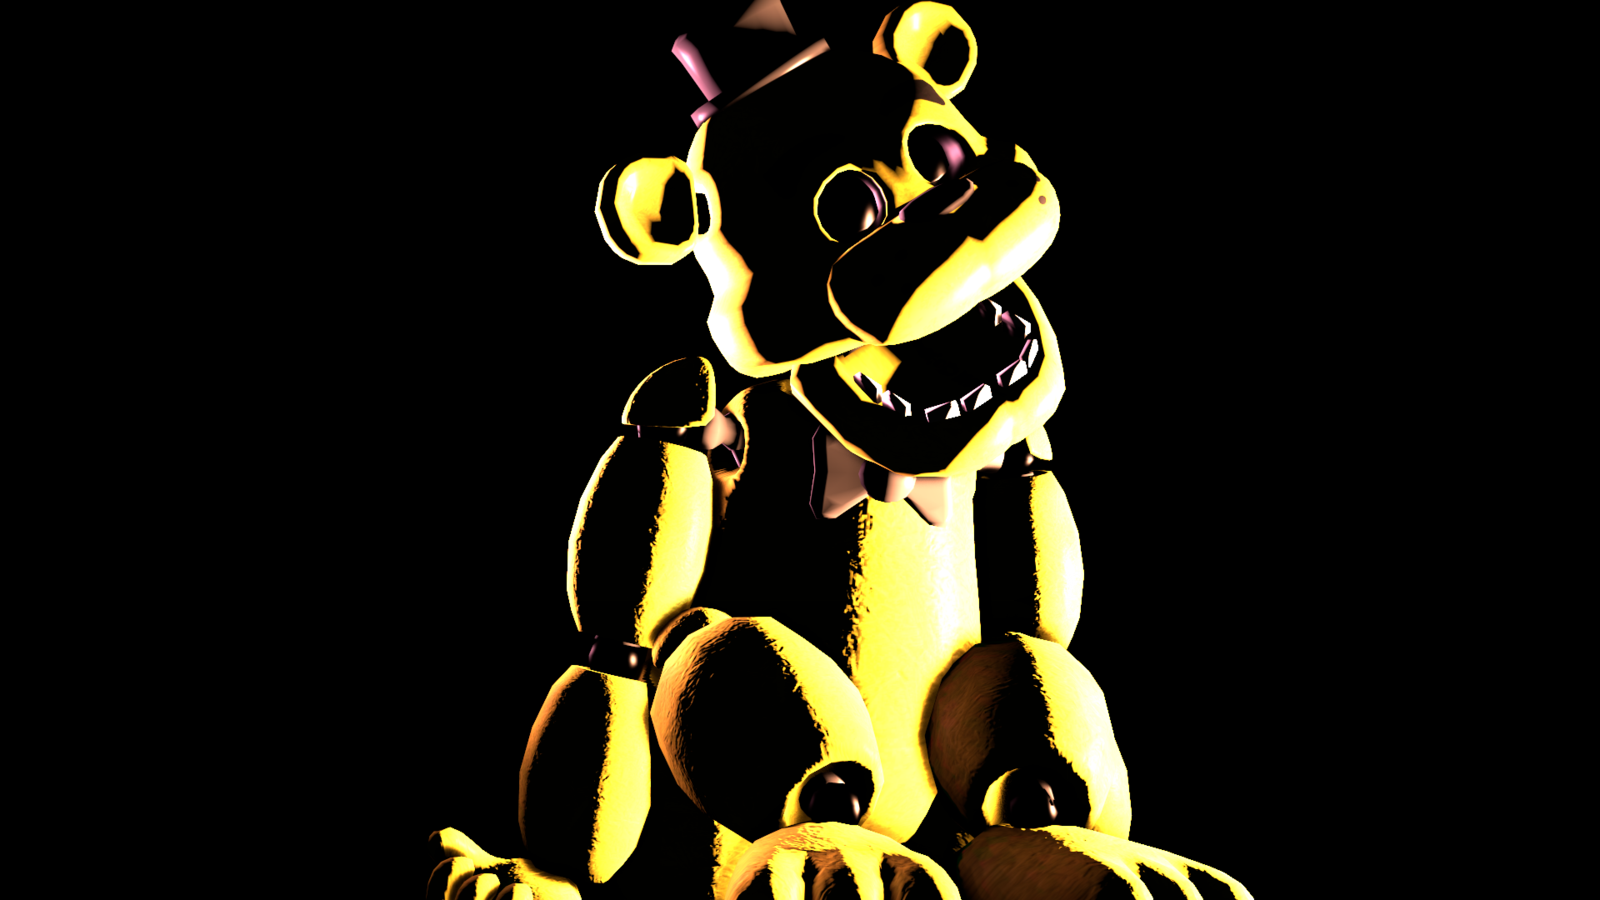 Golden Freddy by ZeFlyingMuppet 1600x900